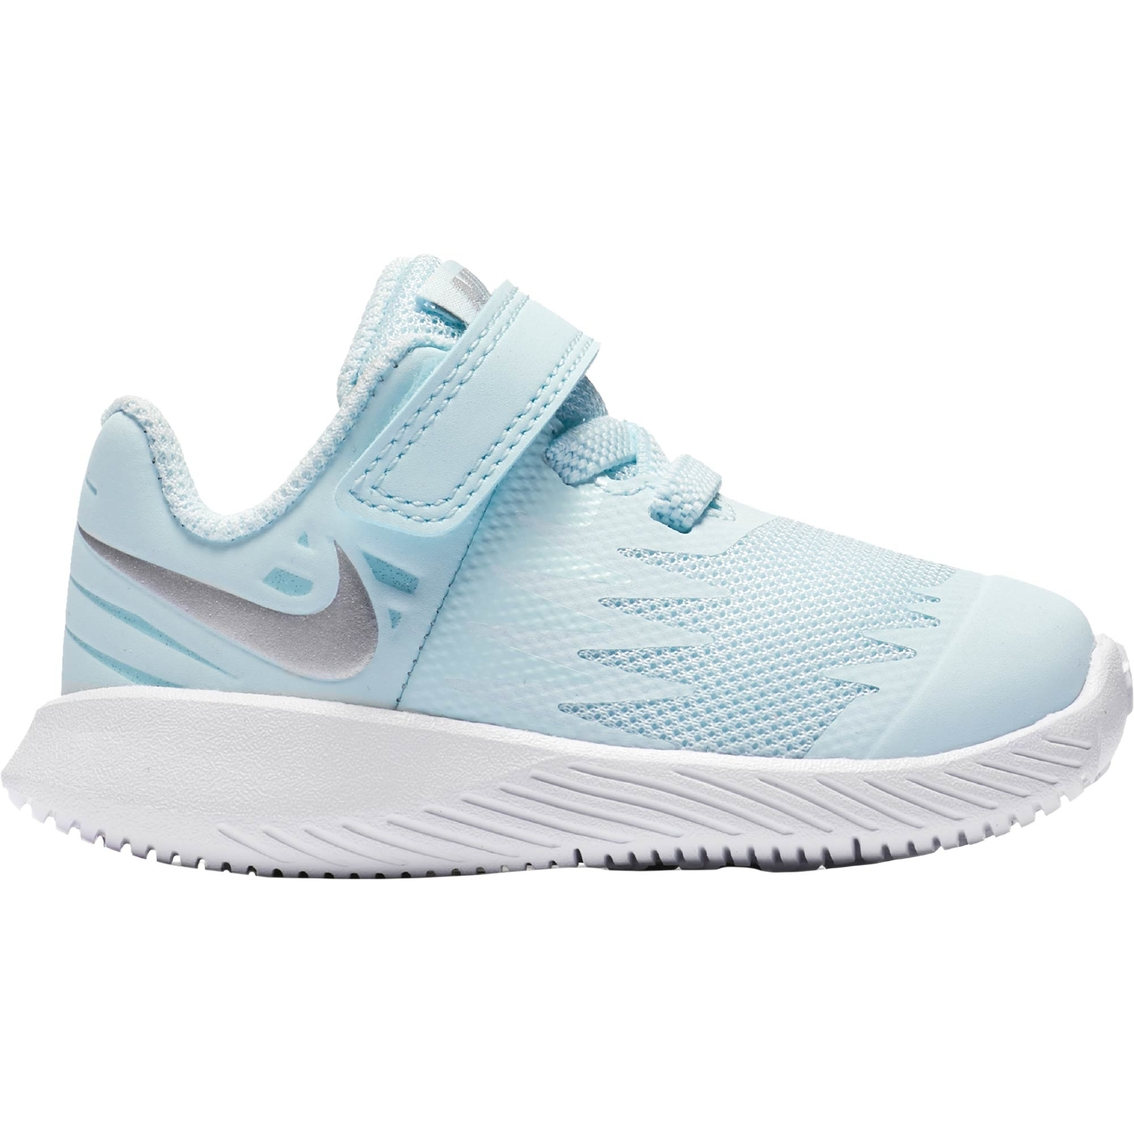 9a7f14dbc531 Nike Toddler Girls Star Runner (td) Shoes